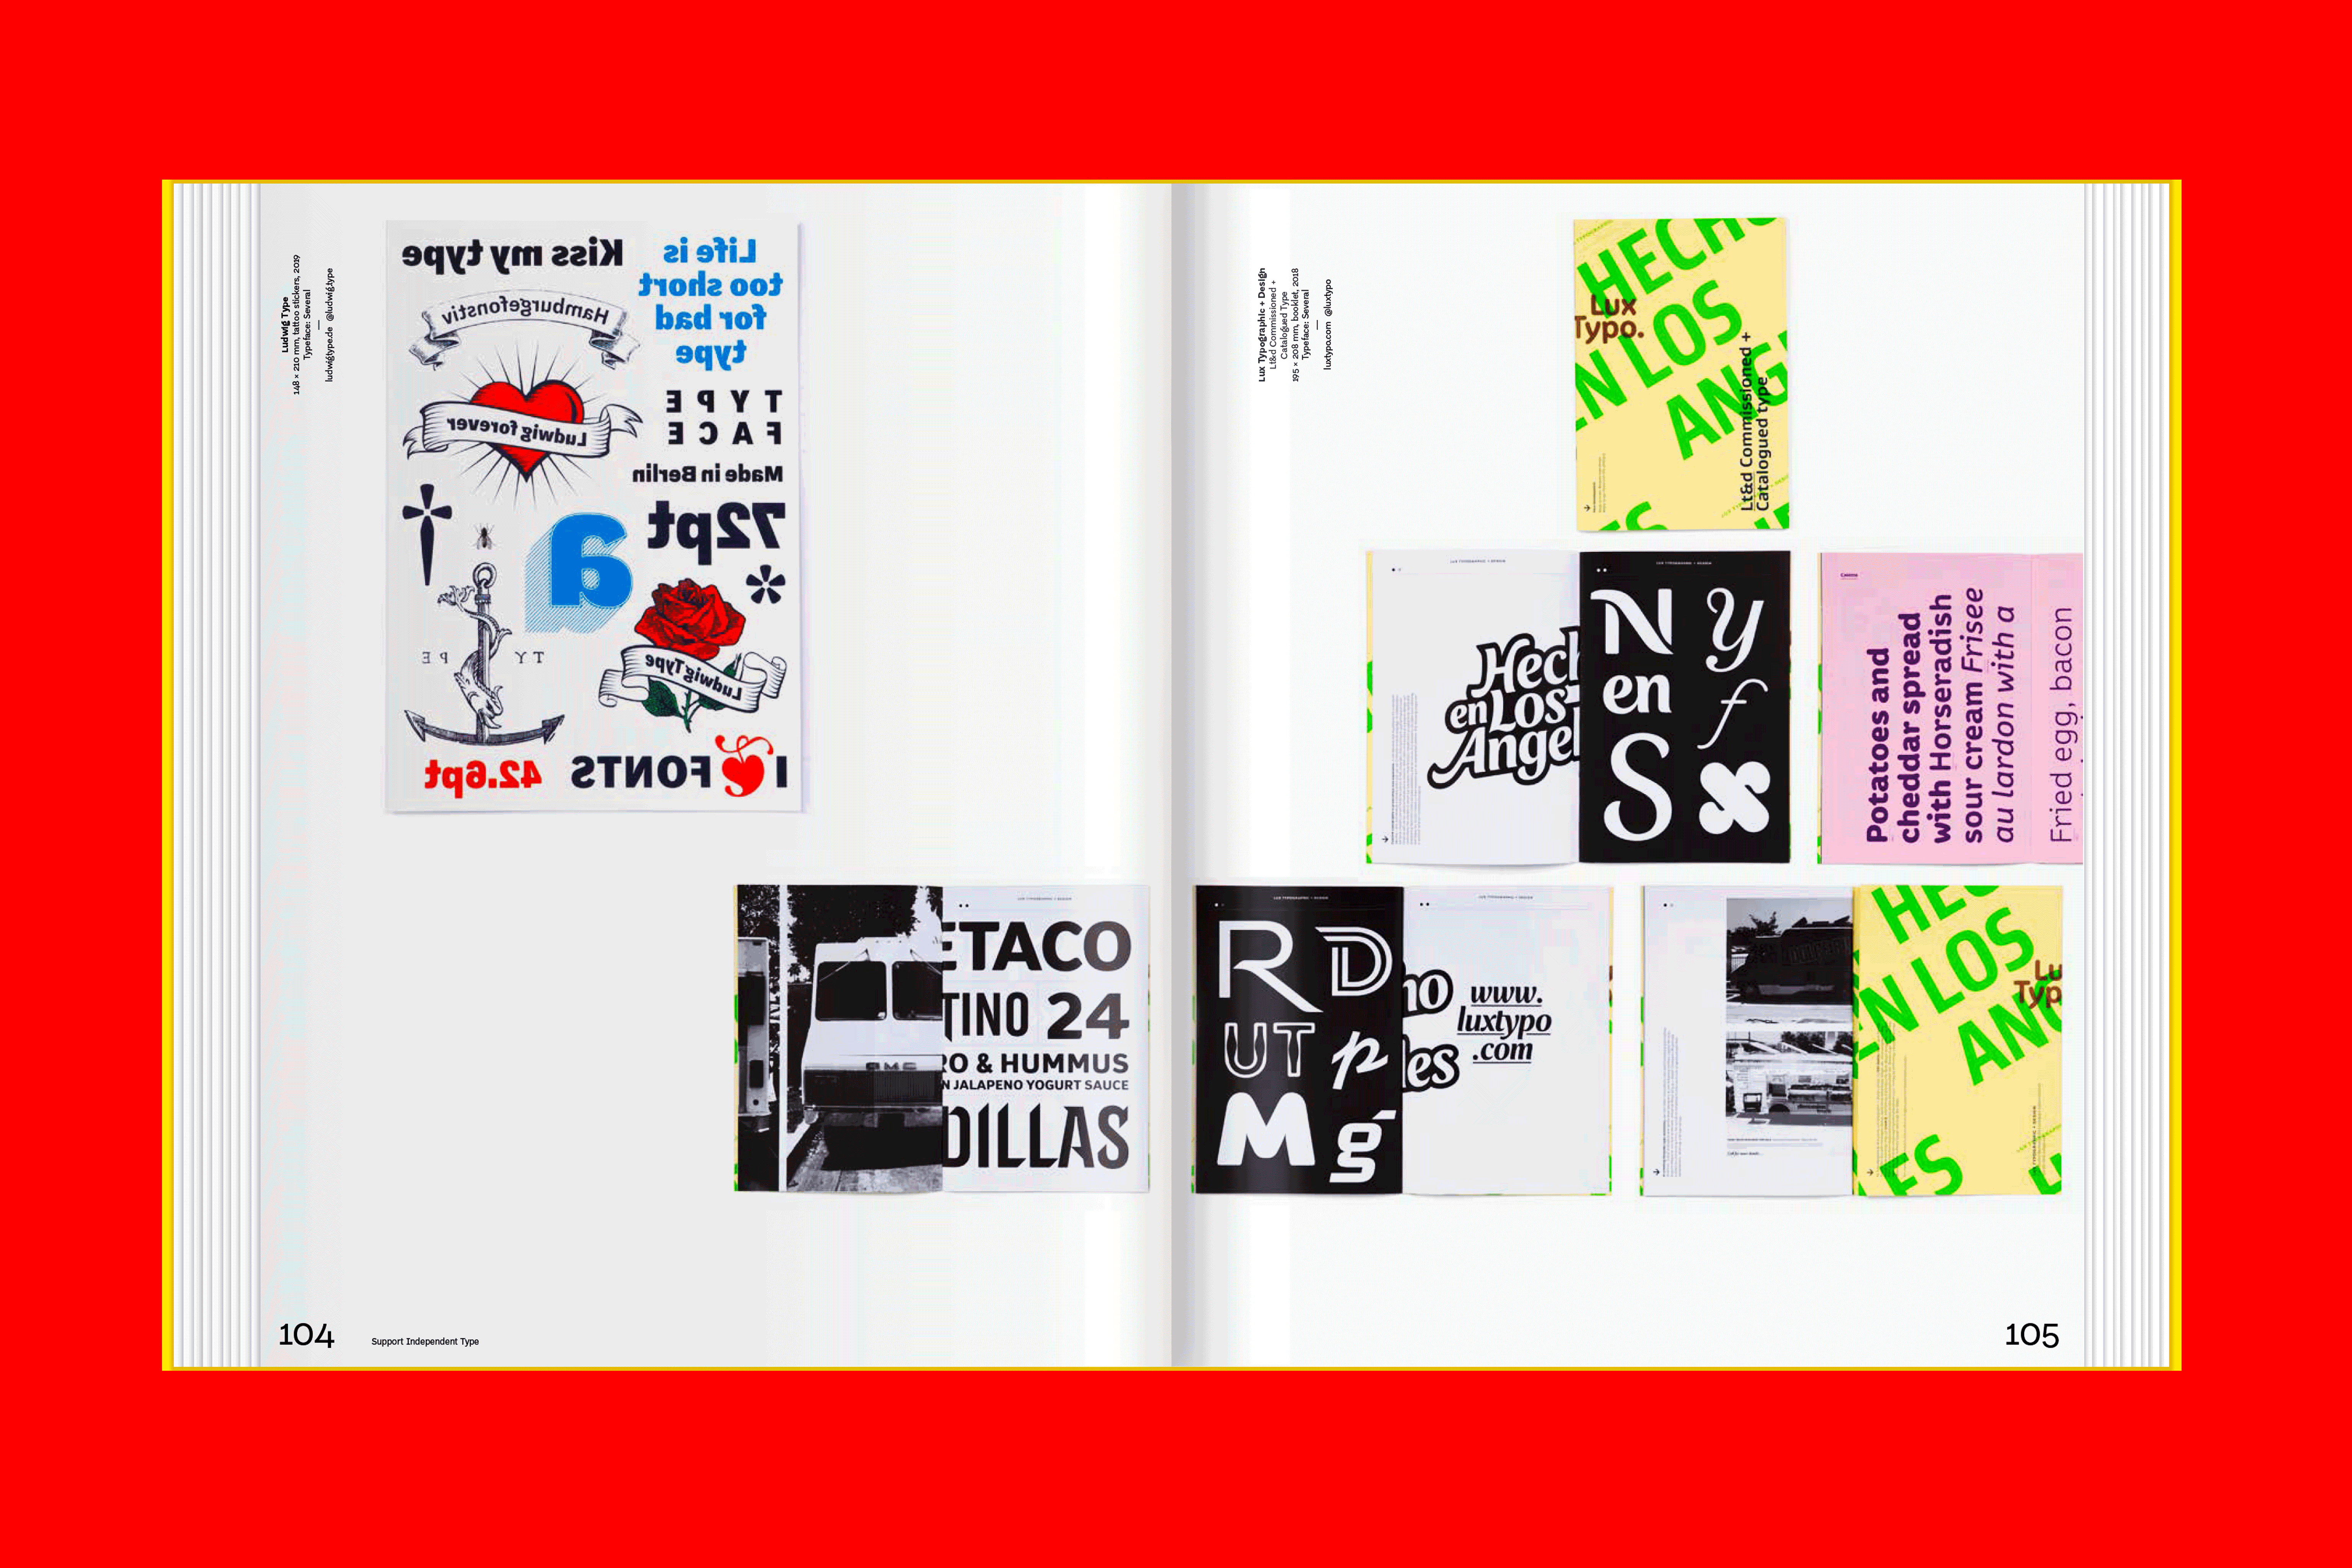 Slanted-Publiaktionen-Slanted-Publishers-Support-Independent-Type_18